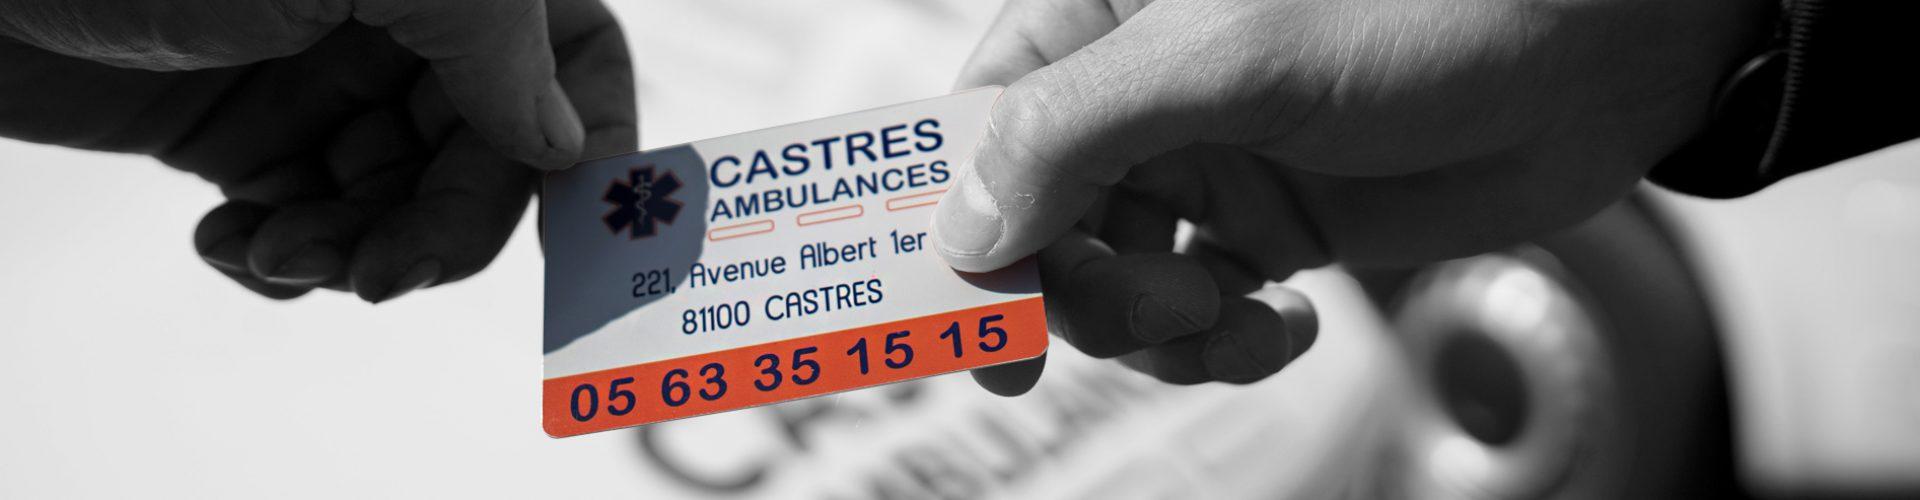 illustration-castres-ambulances-02